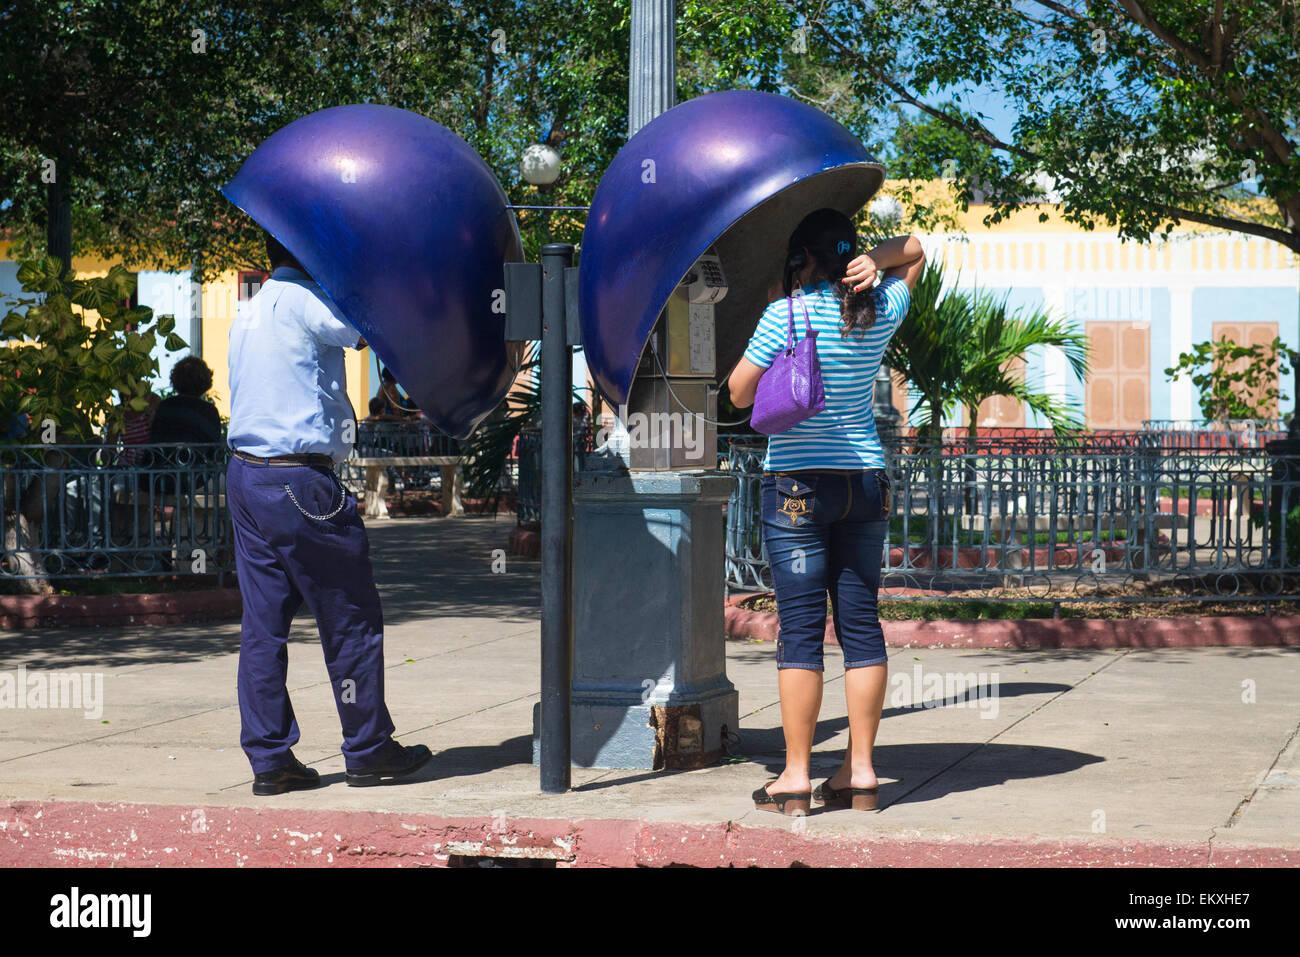 Cuba Trinidad Plaza Carrillo street road scene public phone telephone kiosk kiosks booth booths callers - Stock Image